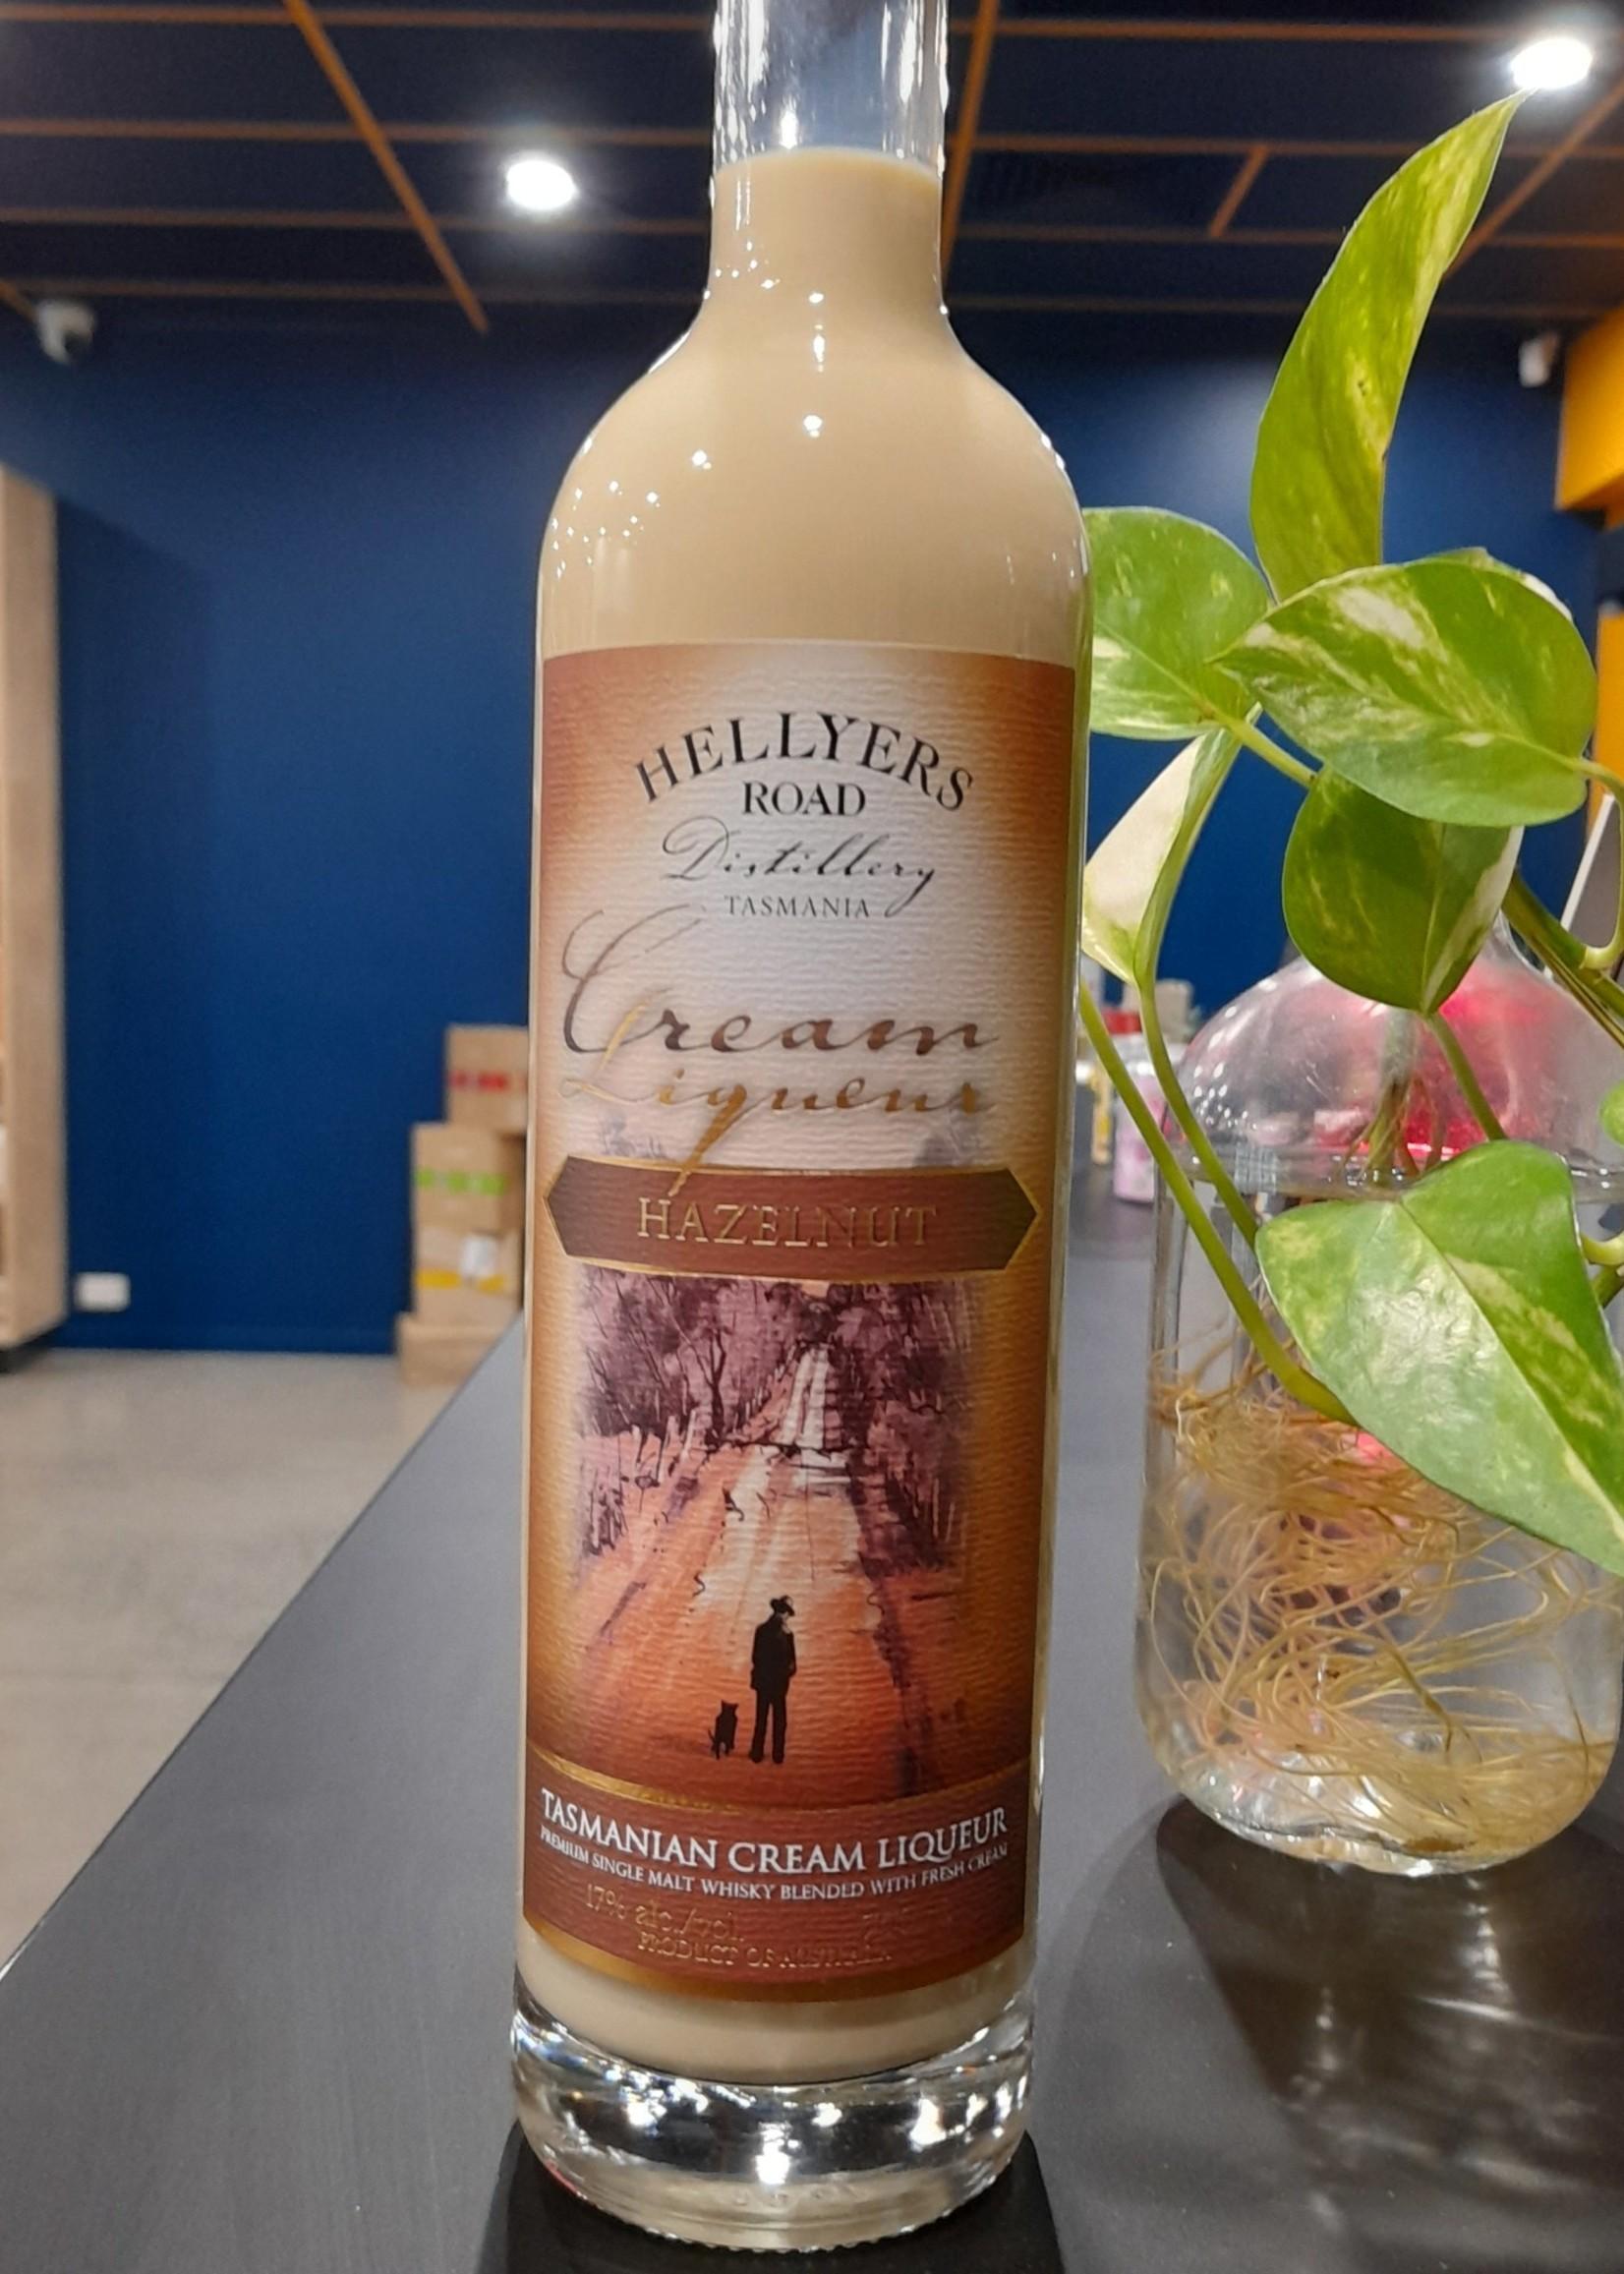 Hellyers Road Hellyers Road Hazelnut Whisky Cream Liqueur